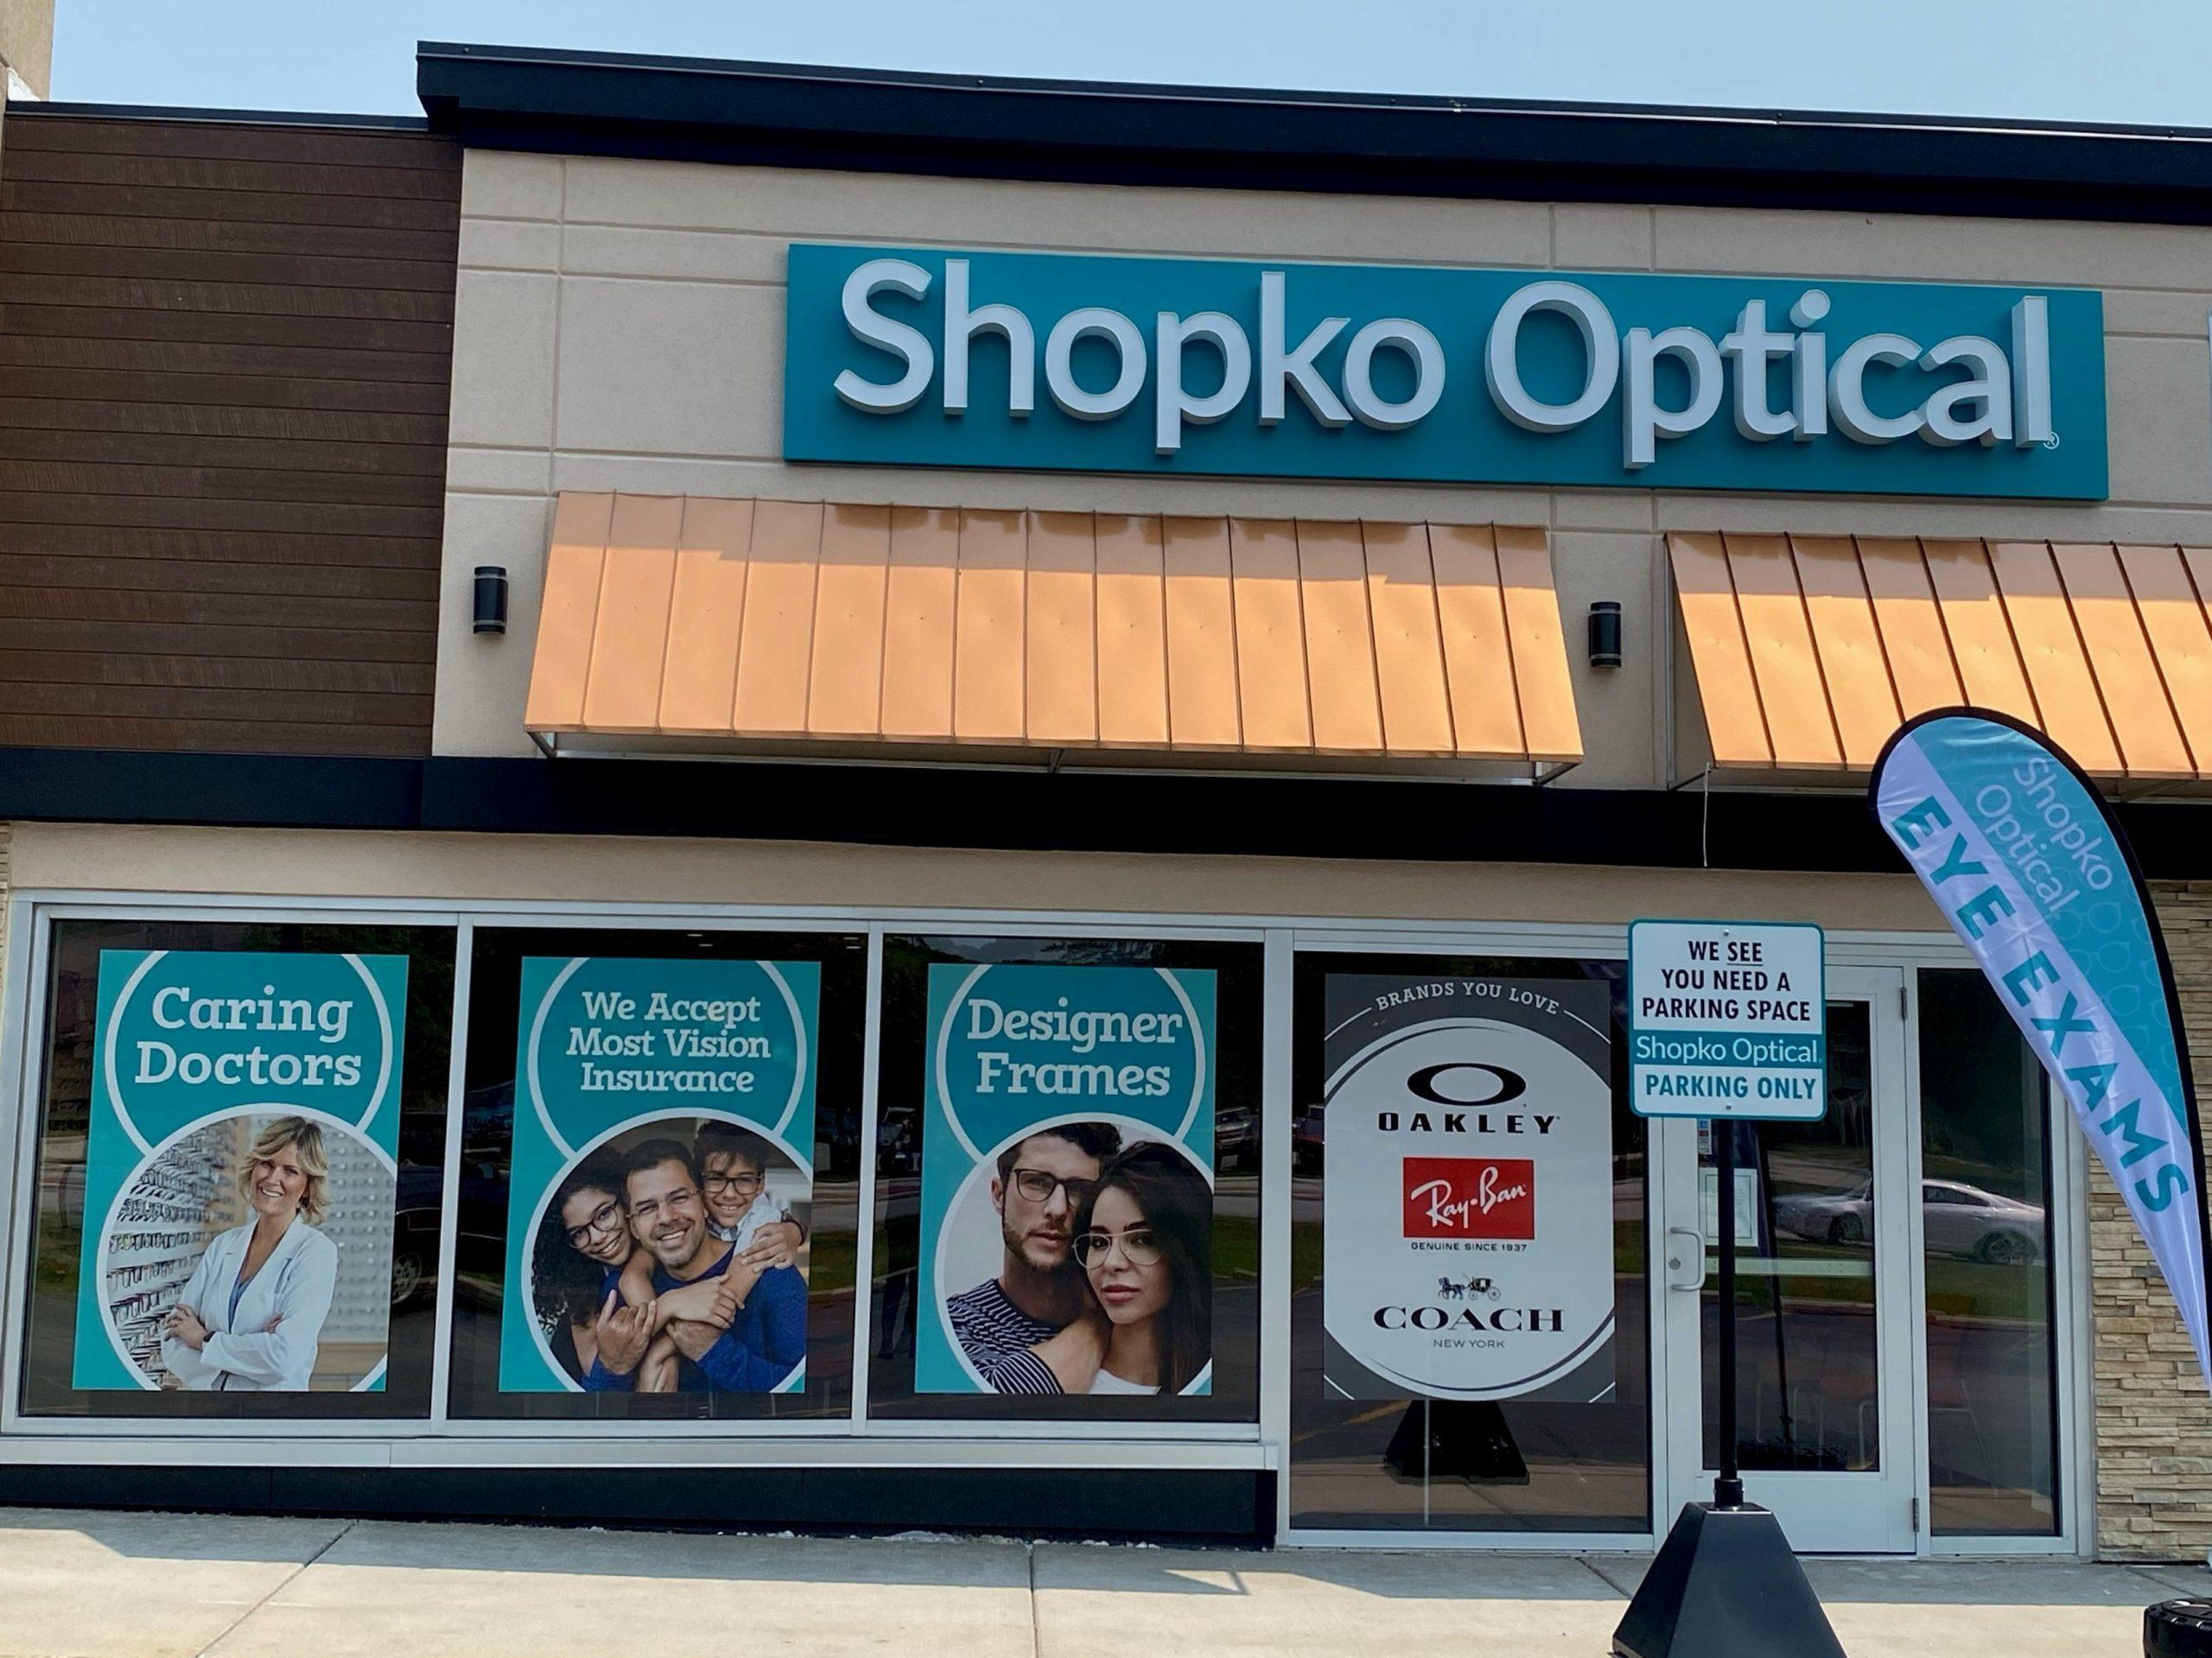 storefront 244 - Hales Corners Shopko Optical